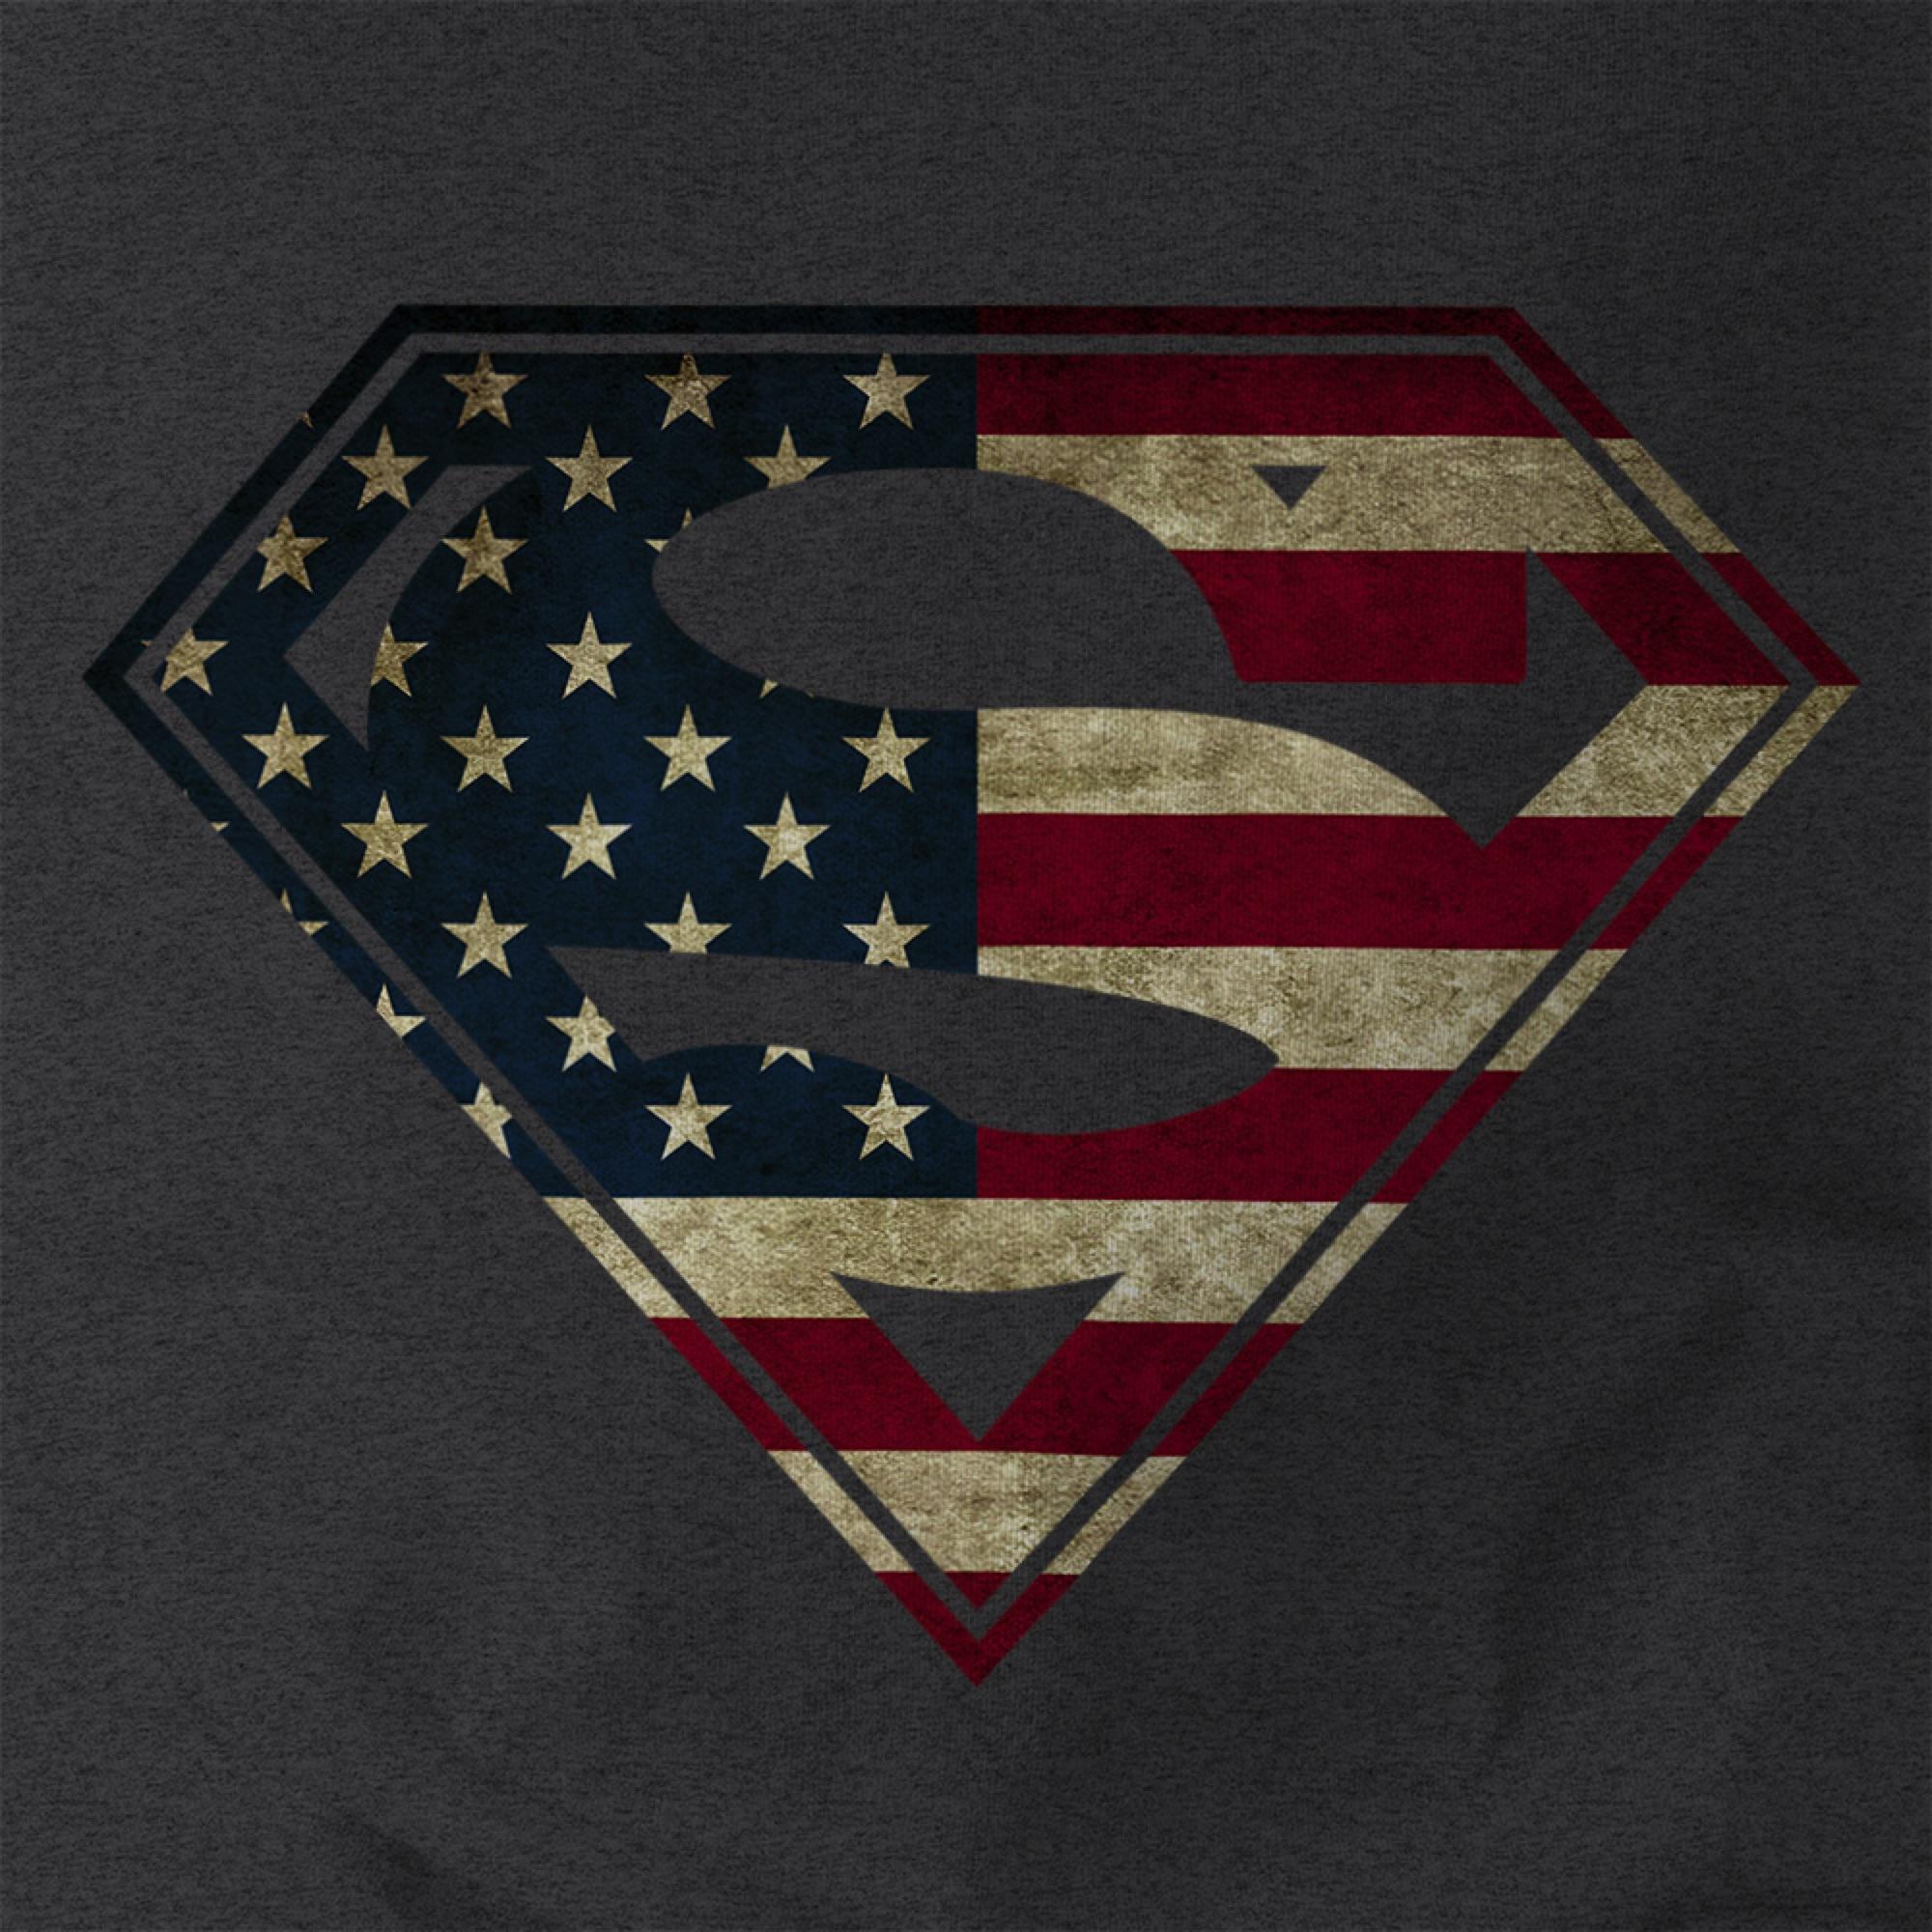 American flag superman logo shield mens shirt patriotic usa dc